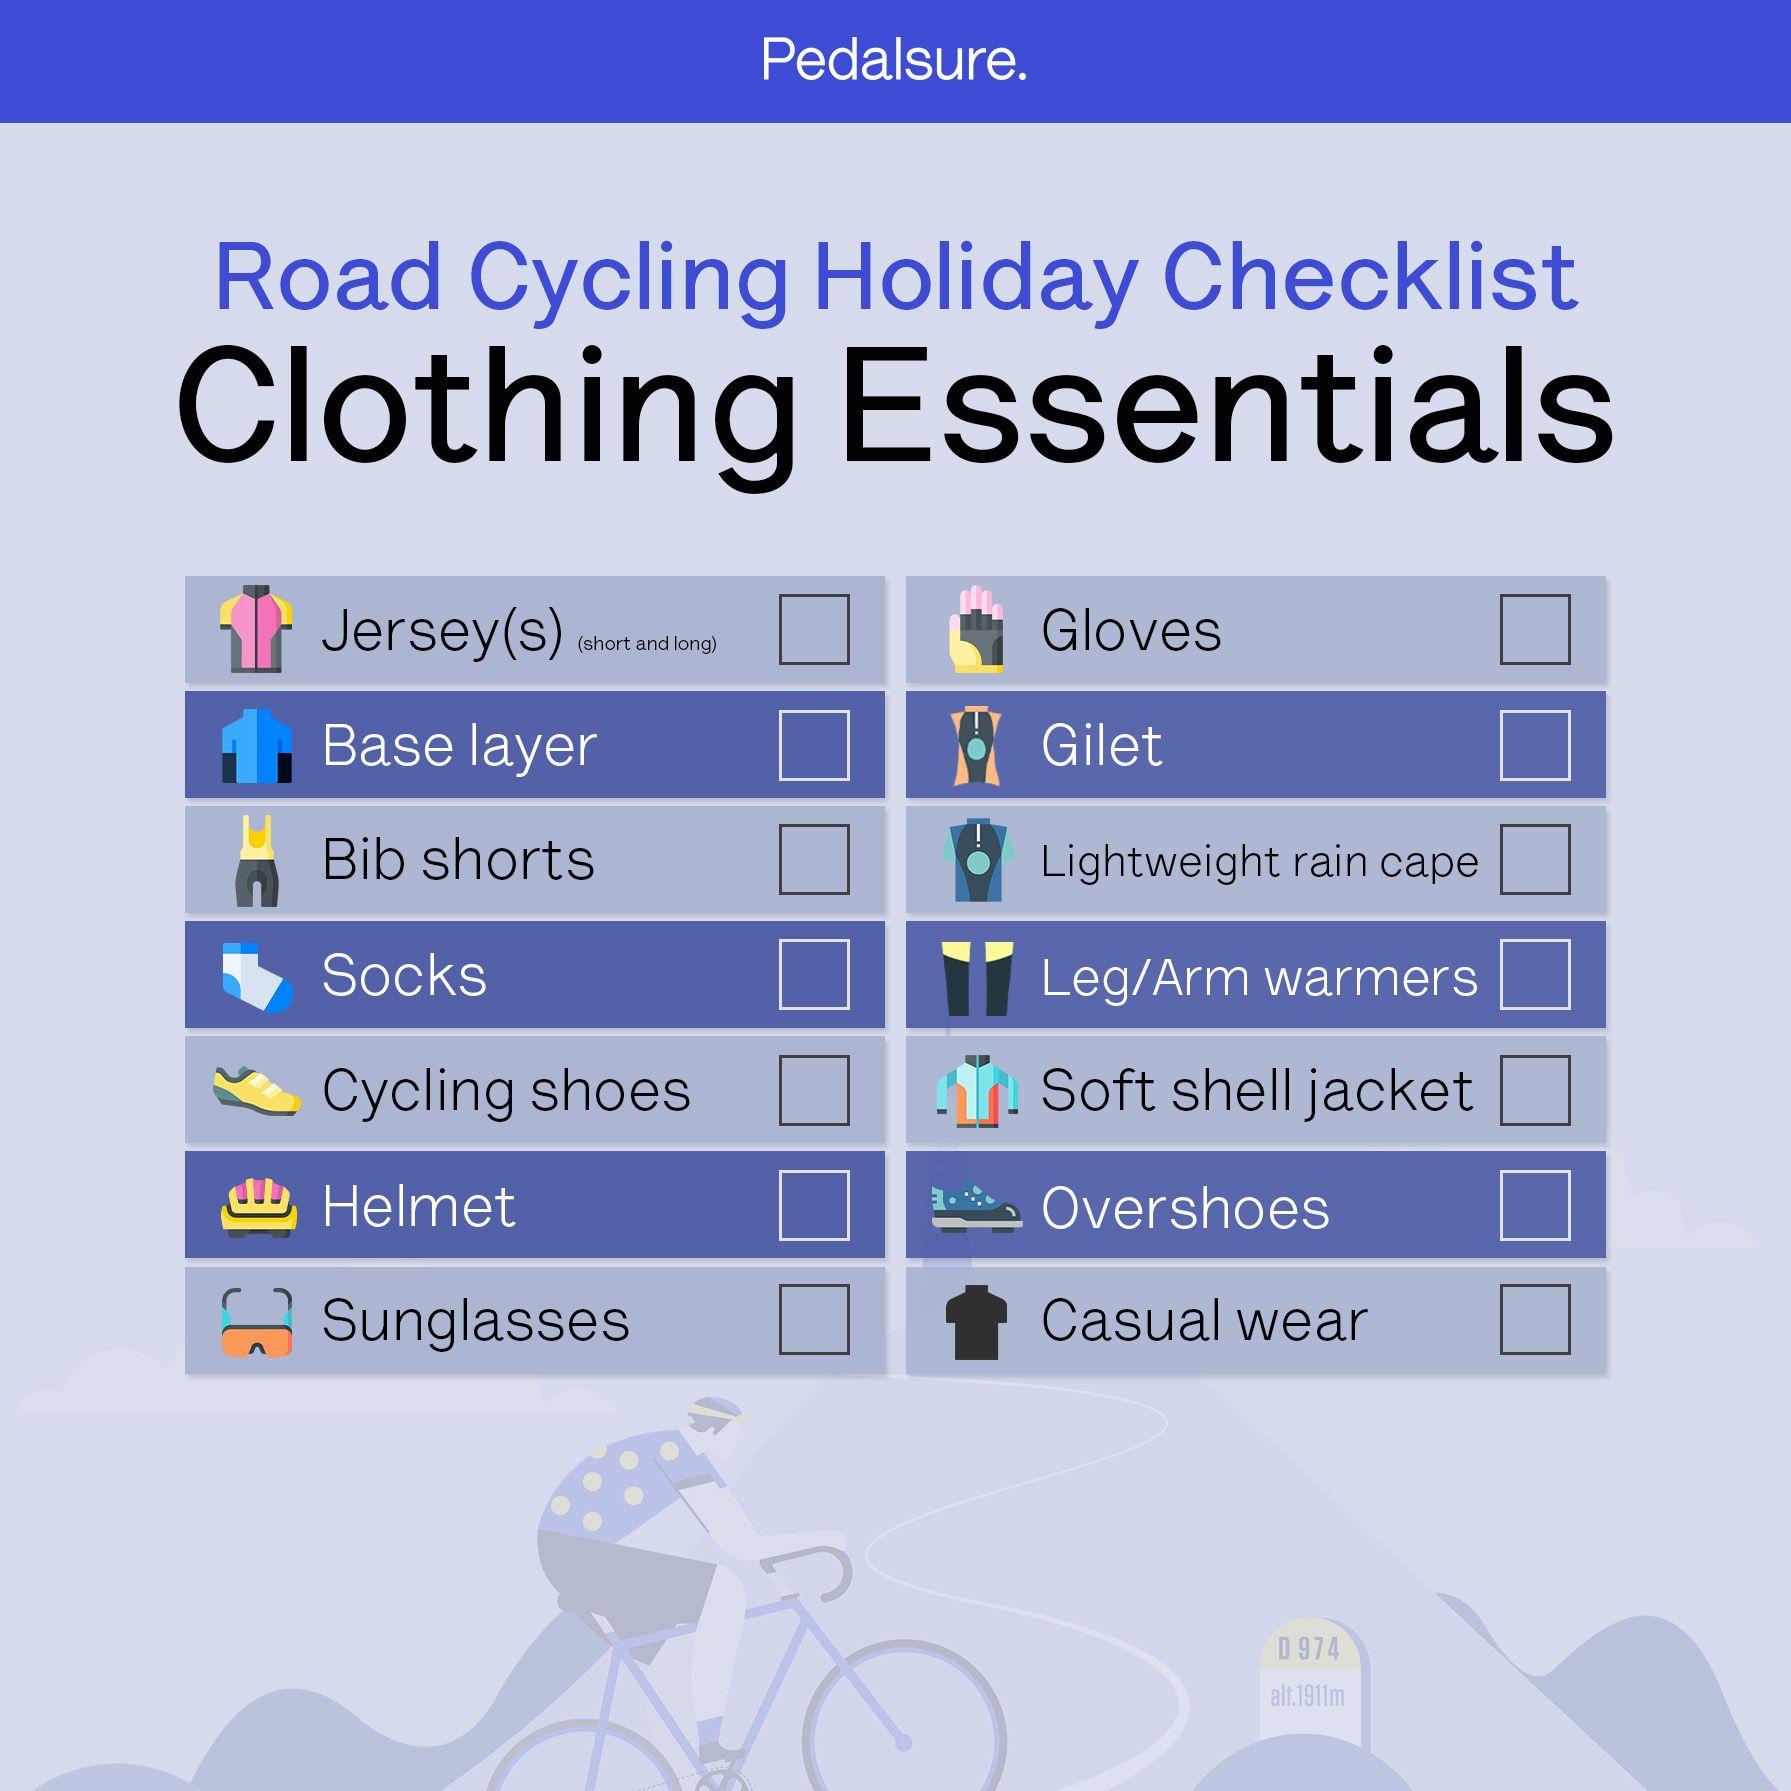 Cycling holiday clothing checklist